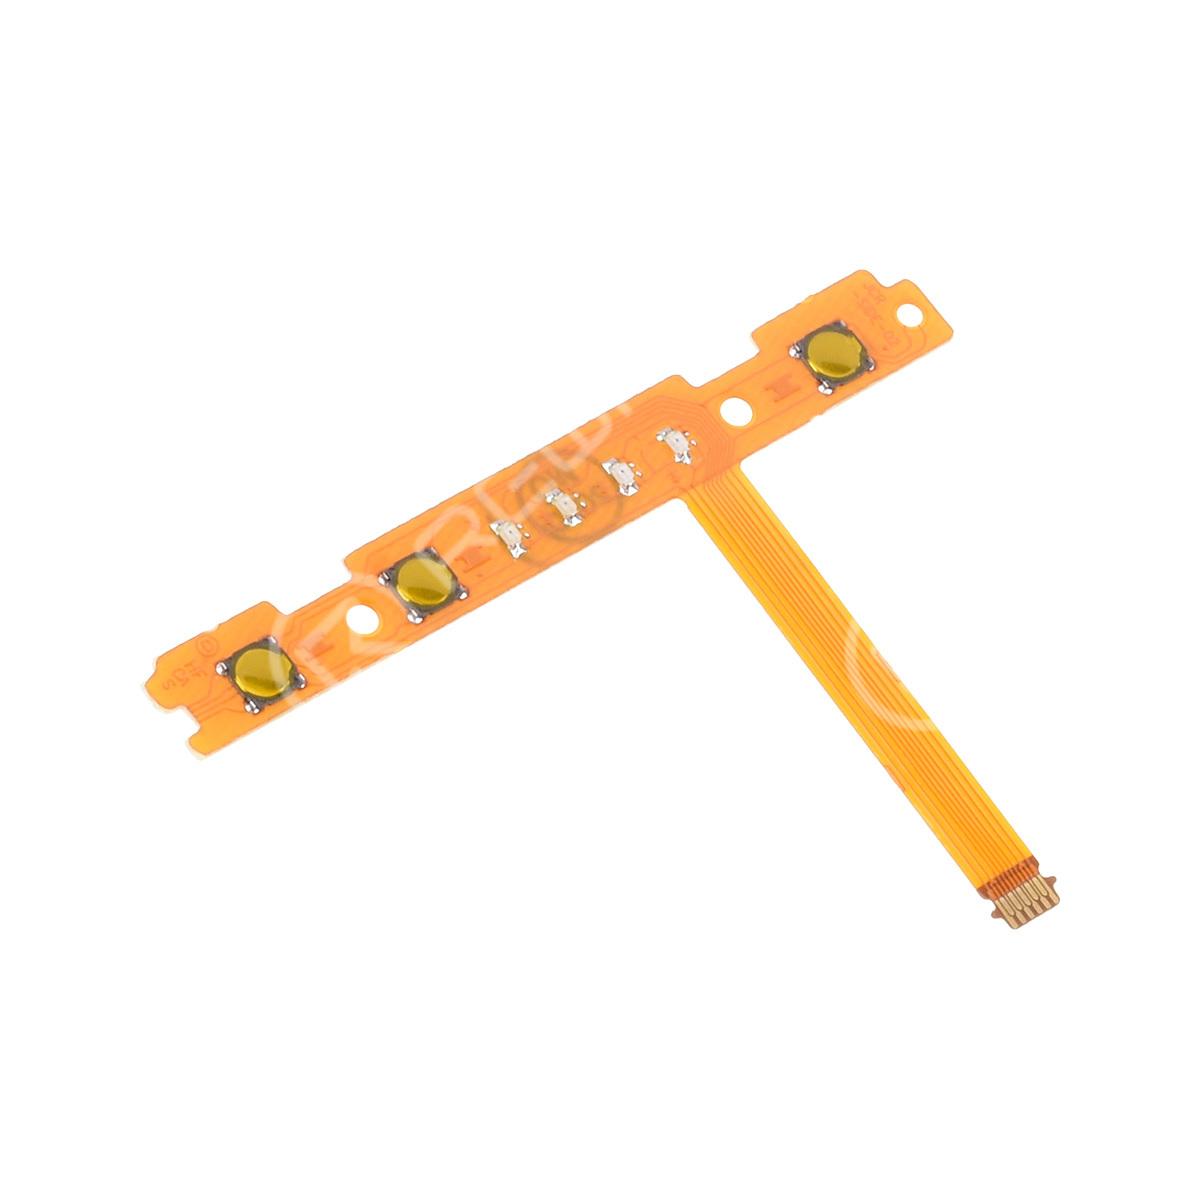 JOY-CON SL Button Flex Cable